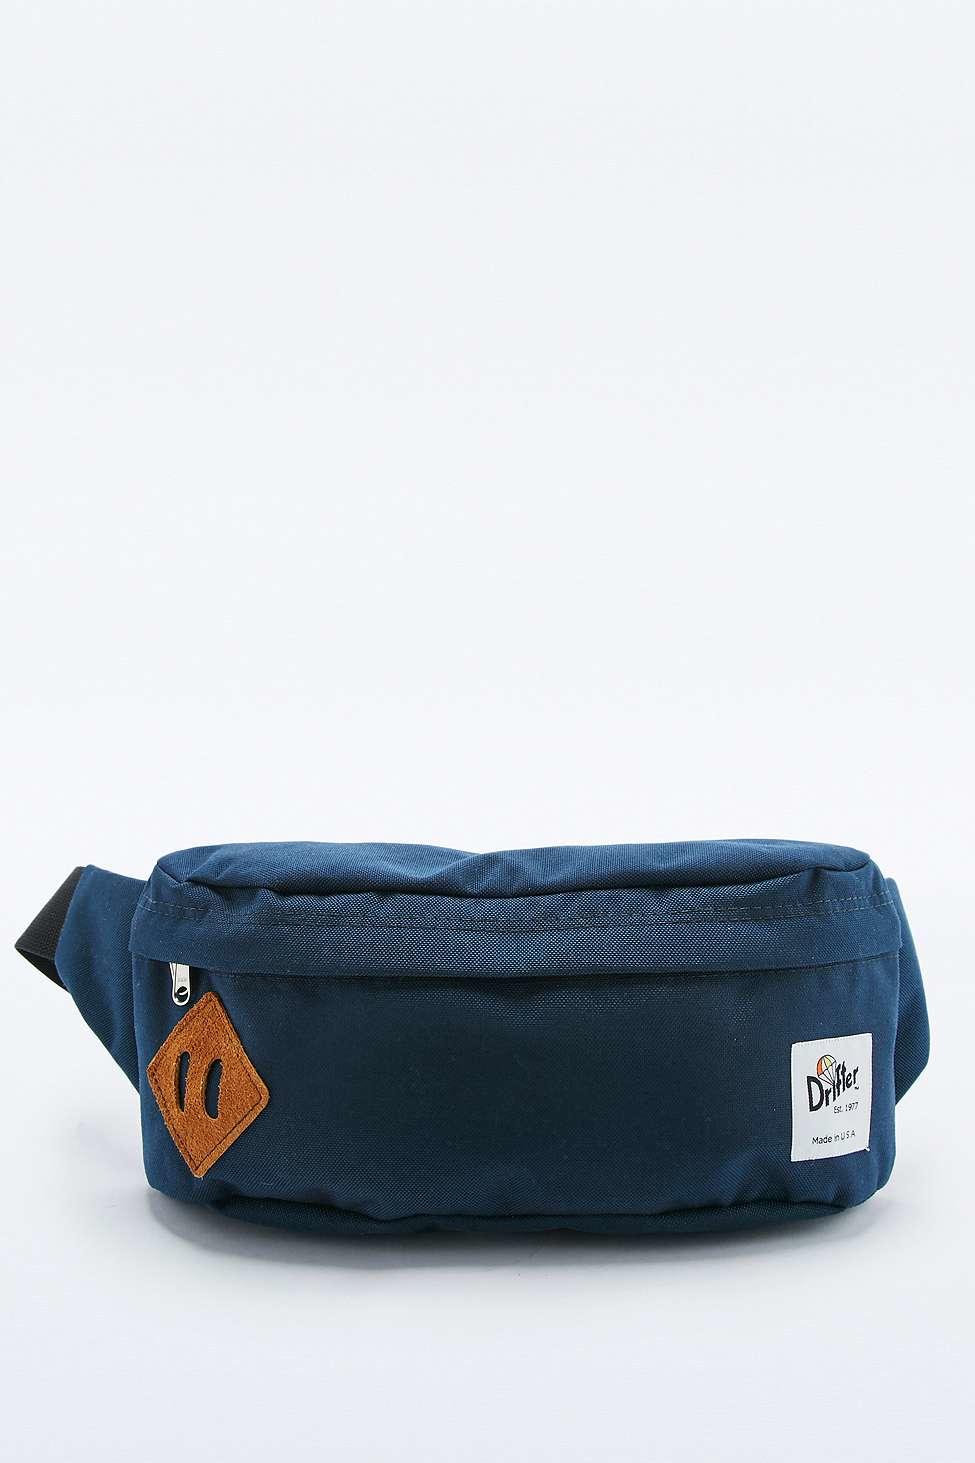 9fa27b635f6e Drifter Classic Navy Hip Sack in Blue for Men - Lyst